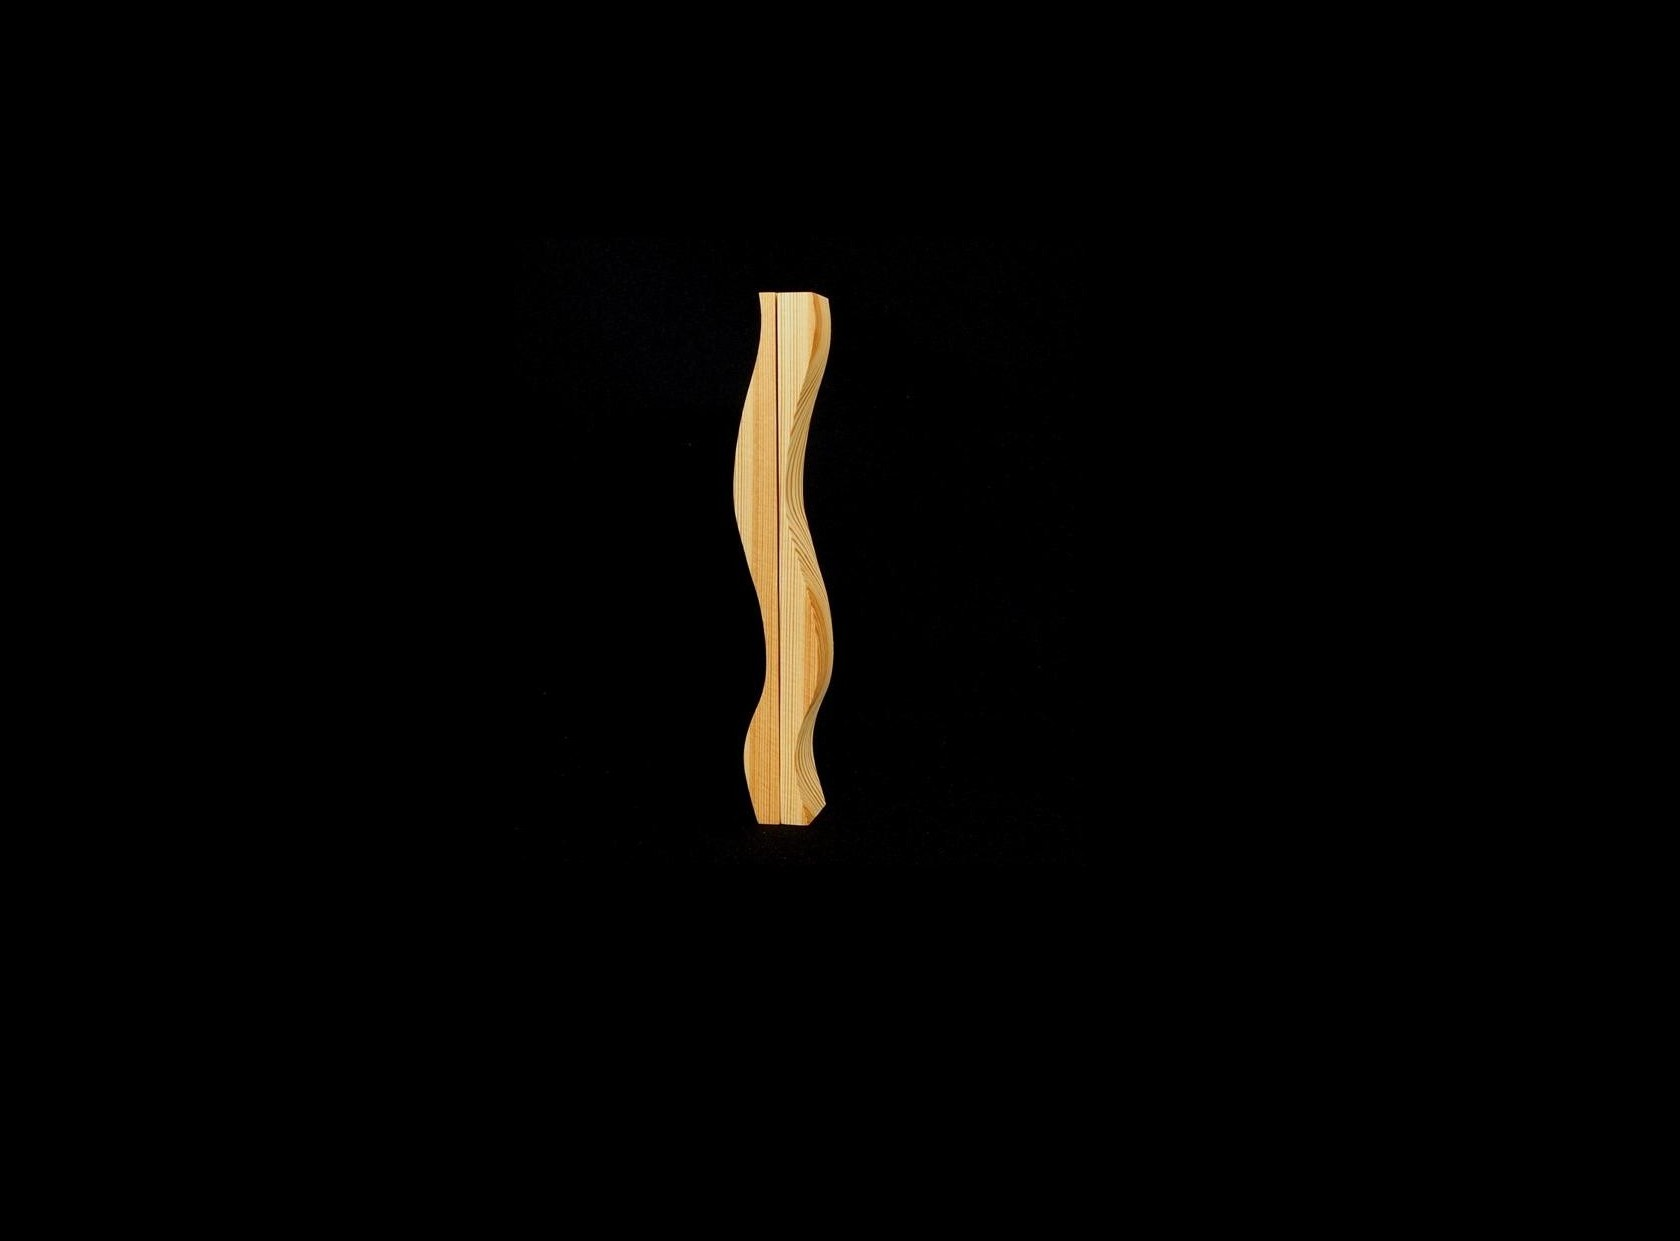 Holzstele_2_1_1a